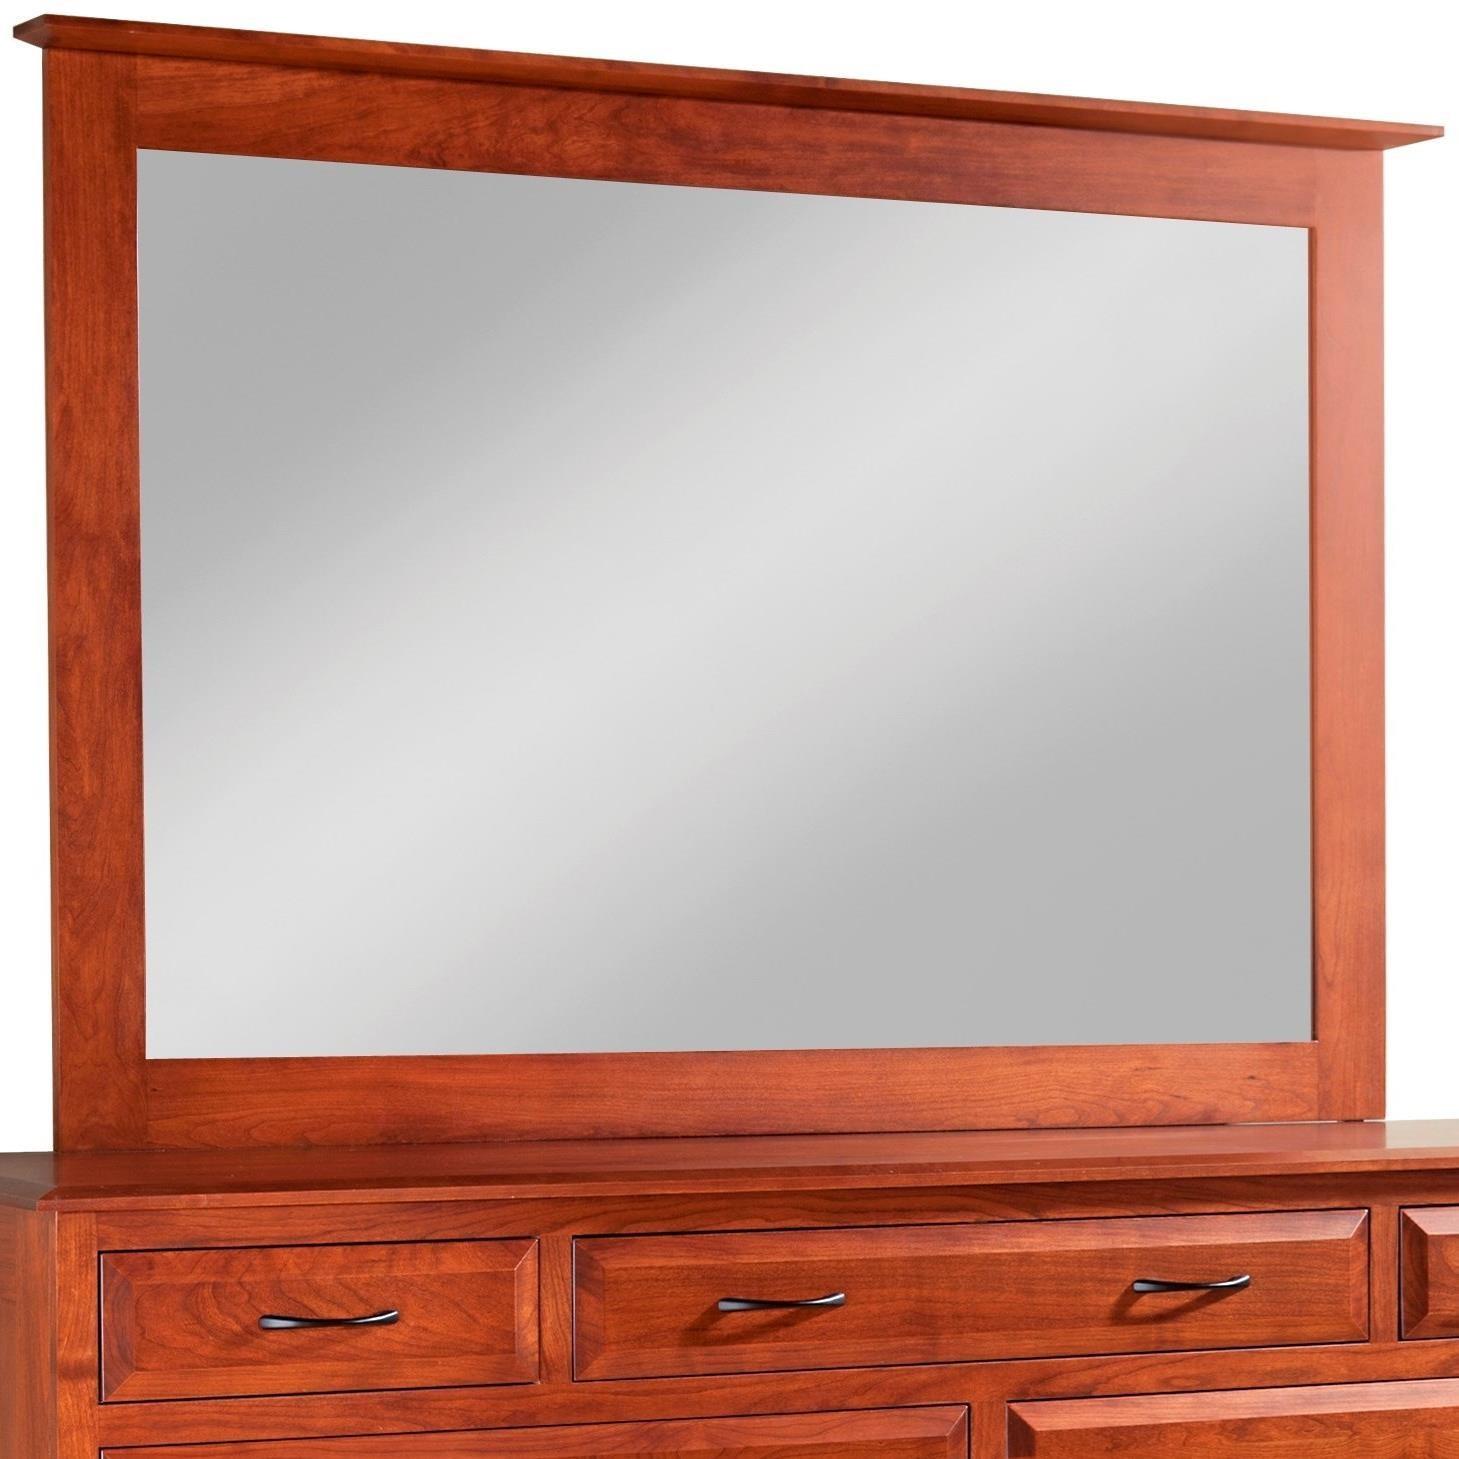 Simplicity Tall Medium Mirror by Daniel's Amish at Saugerties Furniture Mart